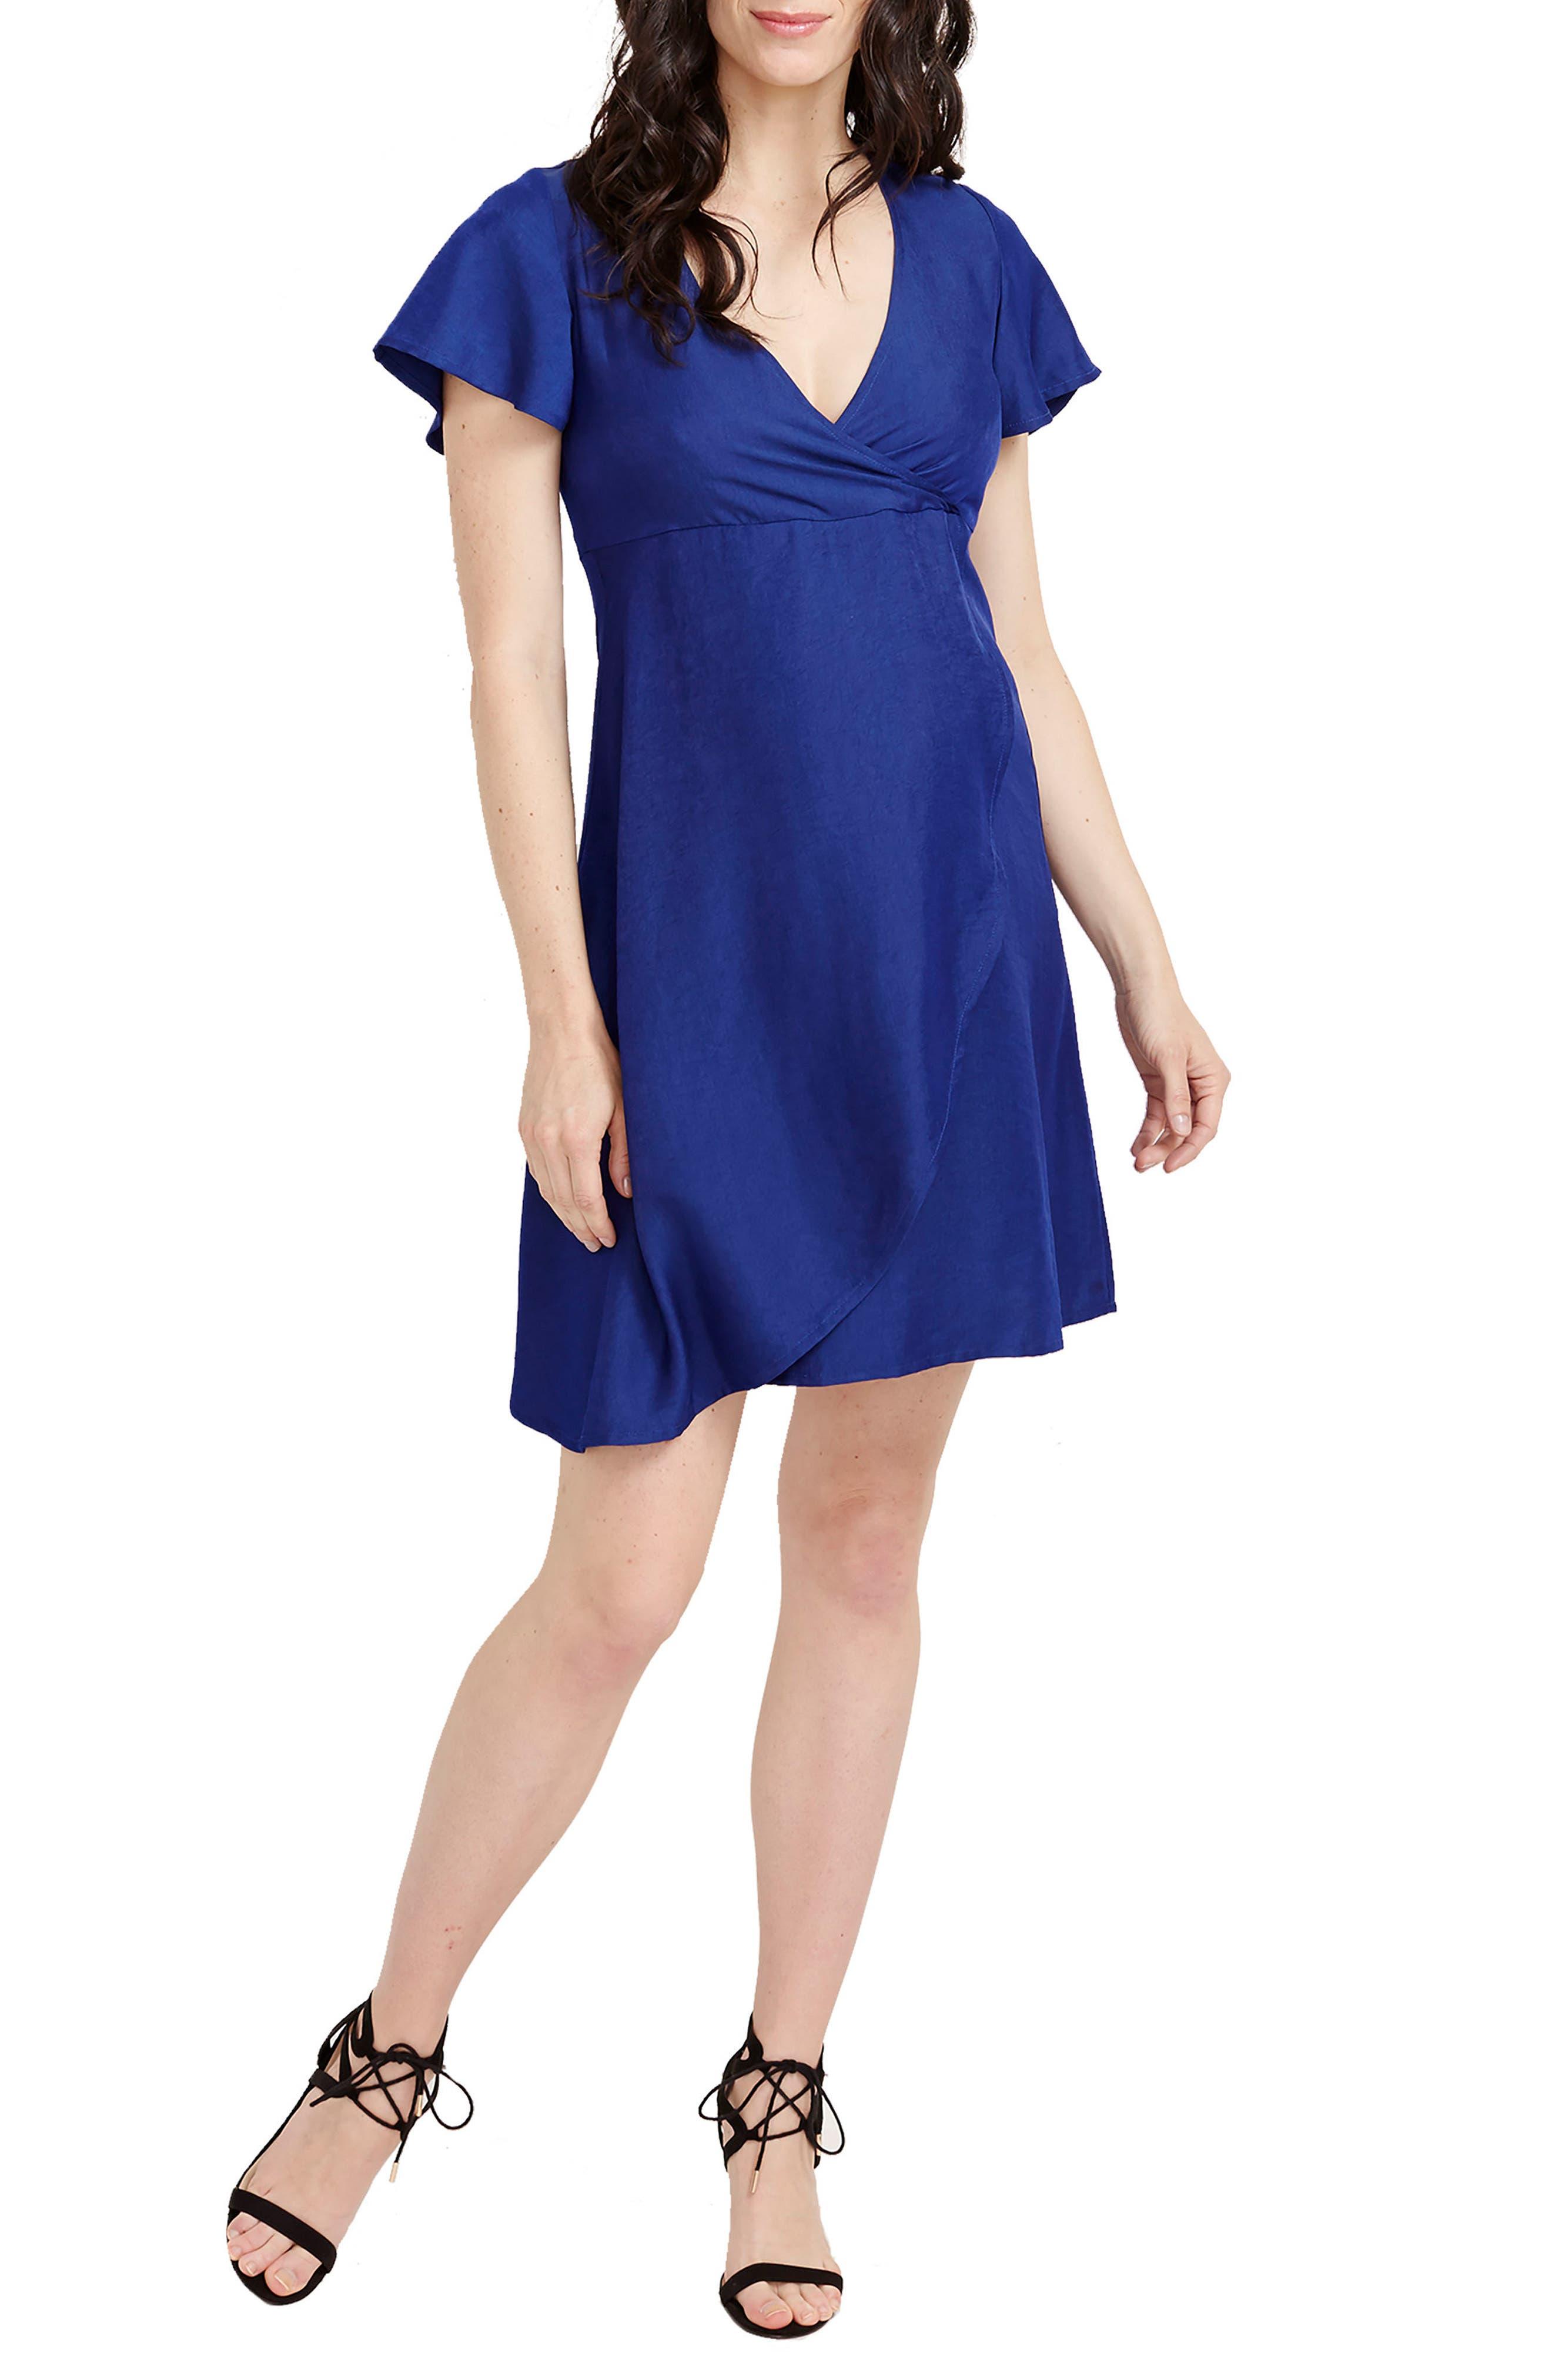 Rosie Pope Grace Maternity Dress